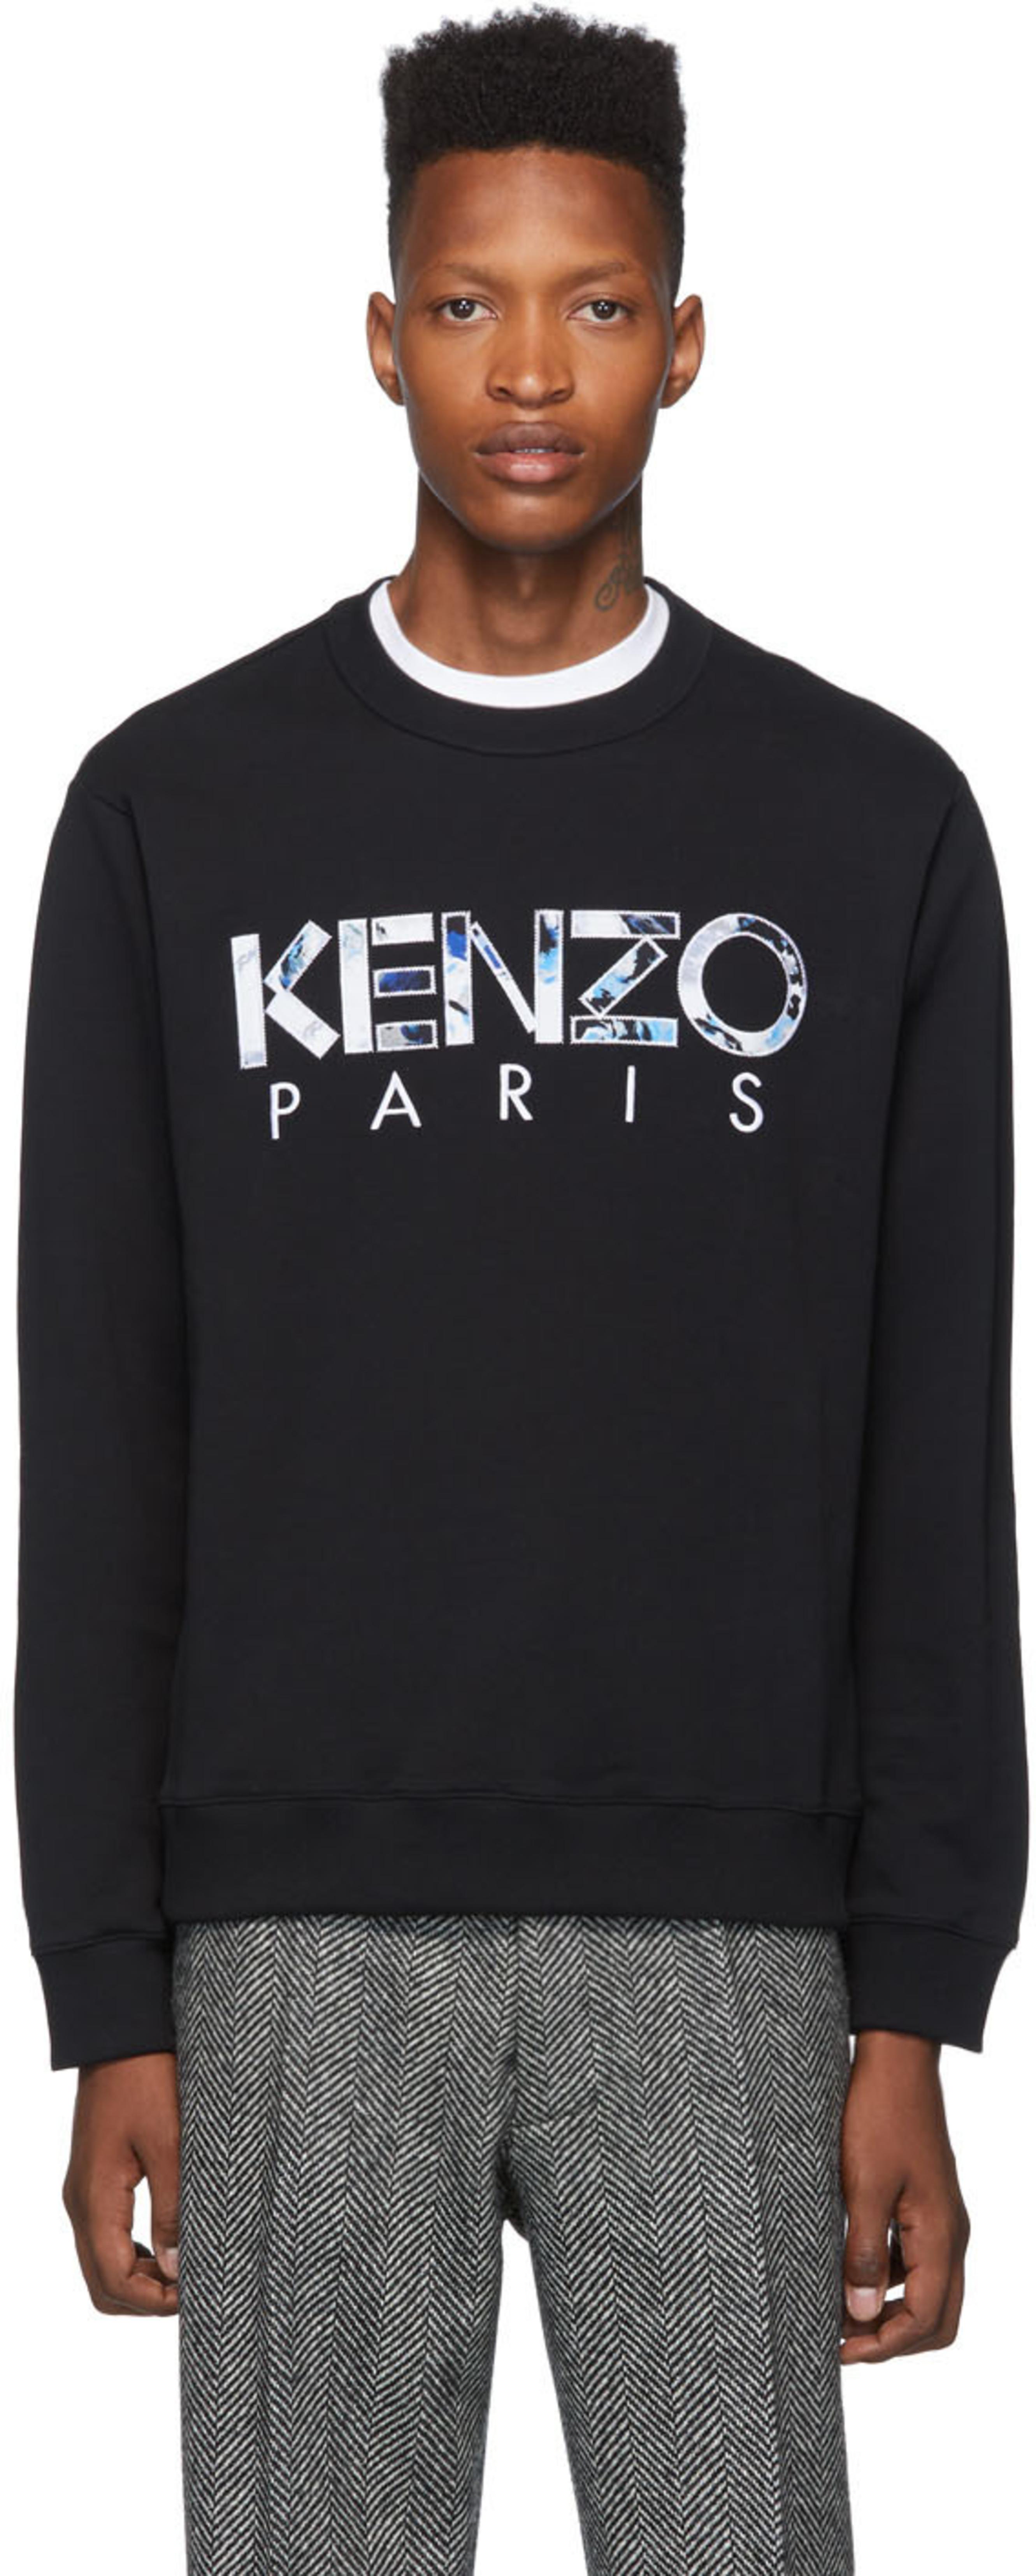 b8c35662 Black Classic 'Kenzo Paris' Sweatshirt